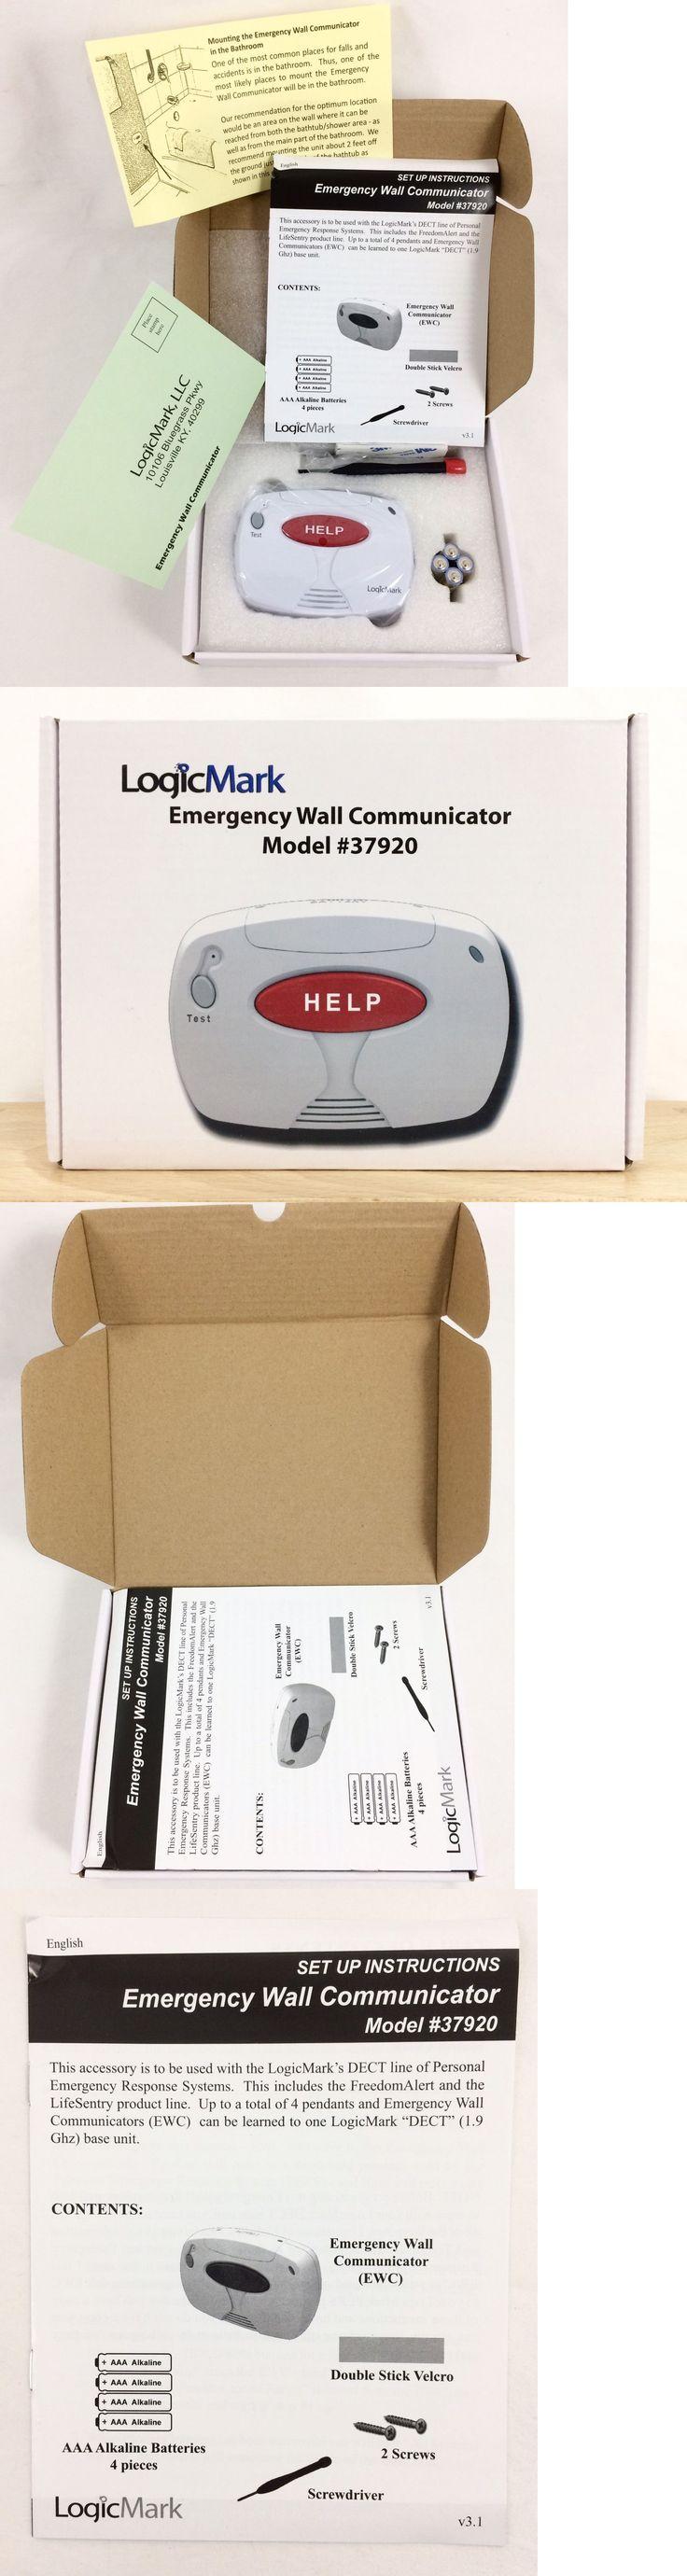 Emergency Alert Systems: Logicmark 37920 Freedom Alert Emergency Wall Communicator Two-Way New! -> BUY IT NOW ONLY: $54.99 on eBay!